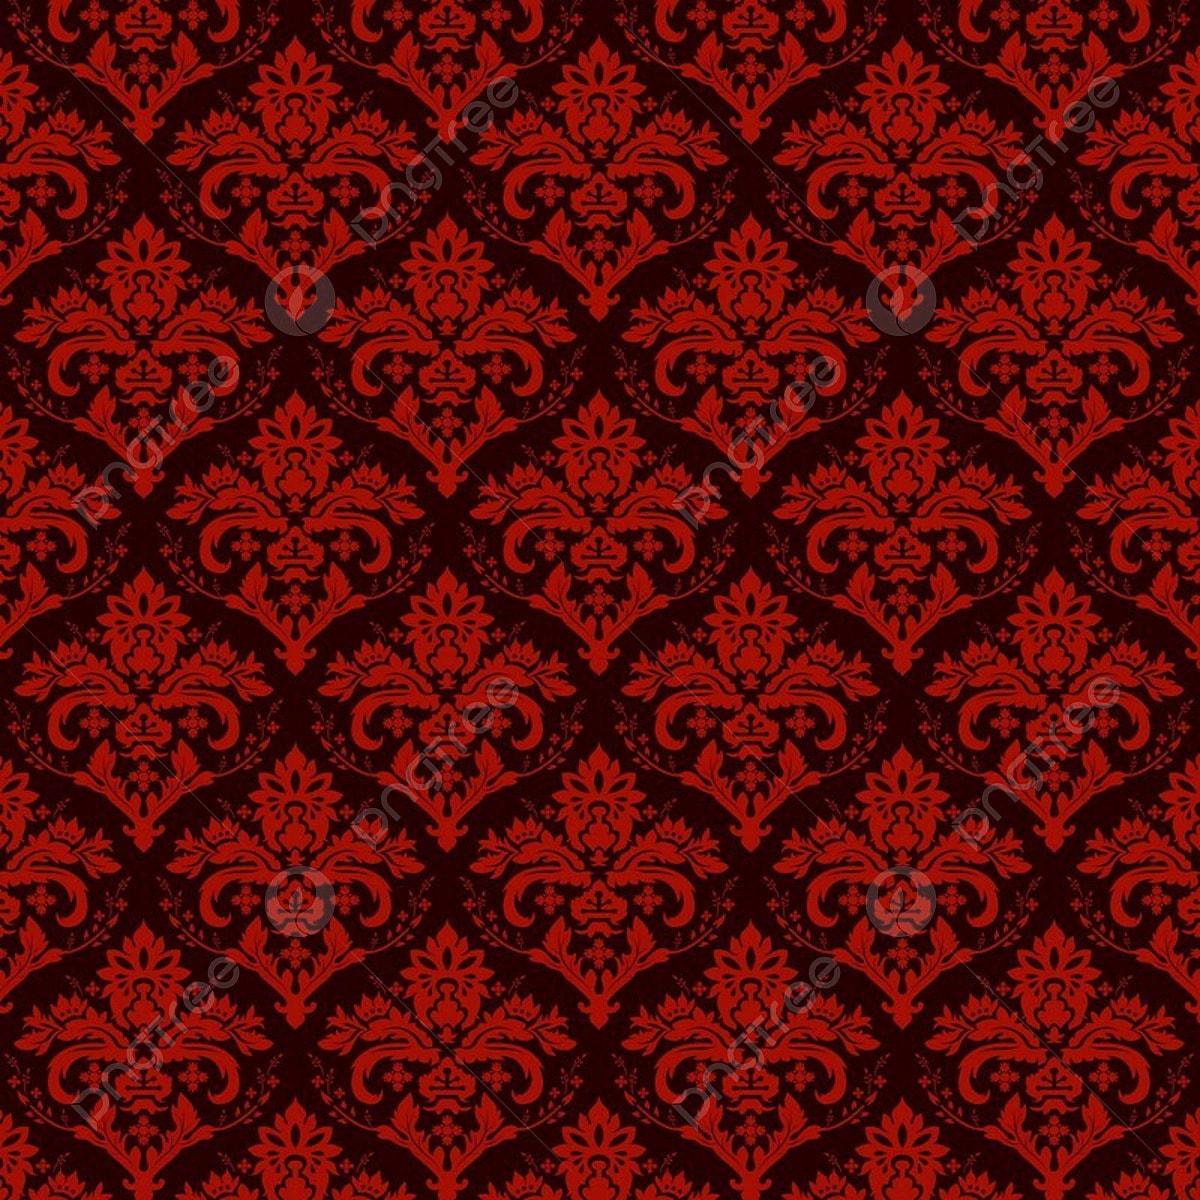 Seamless Luxury Ornamental Background Red Damask Seamless ...